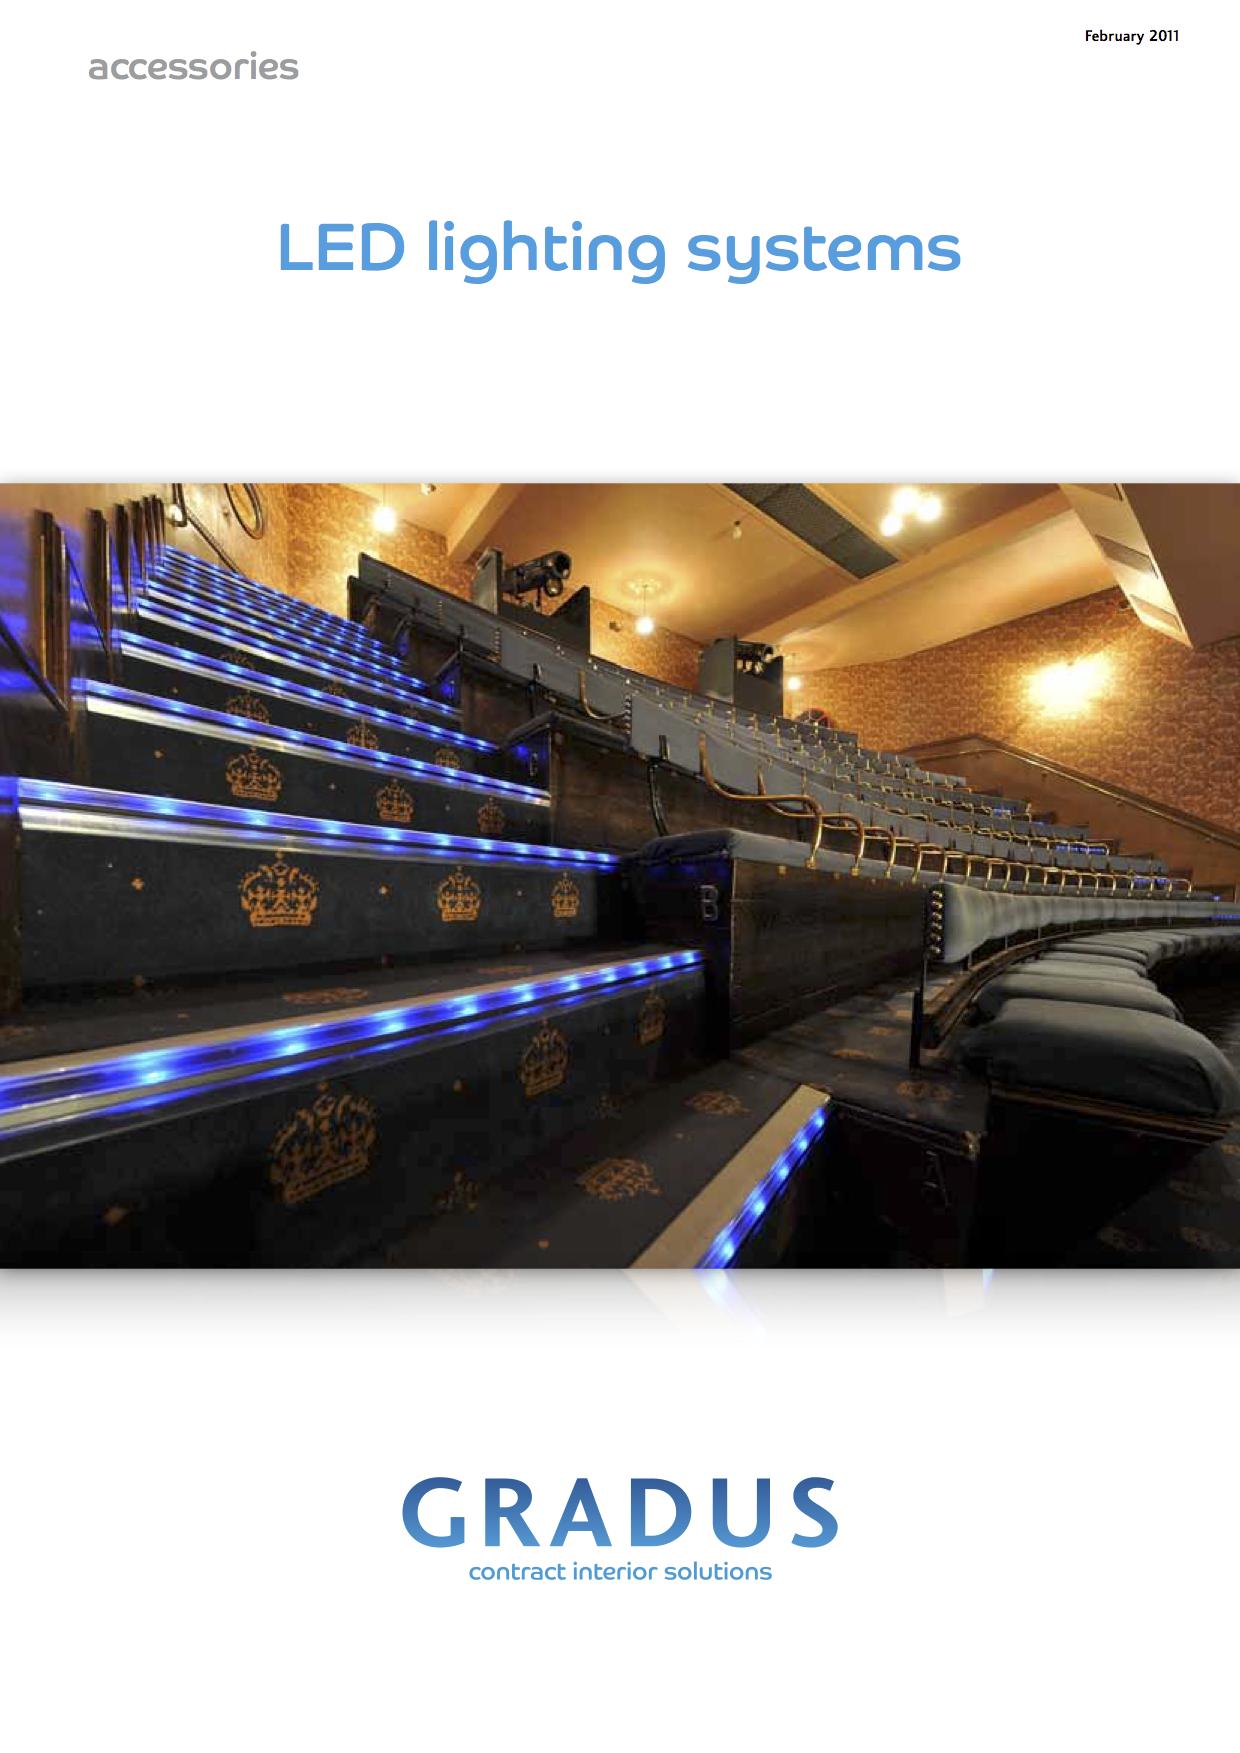 LED_Lighting_Systems_Leaflet_cover.png